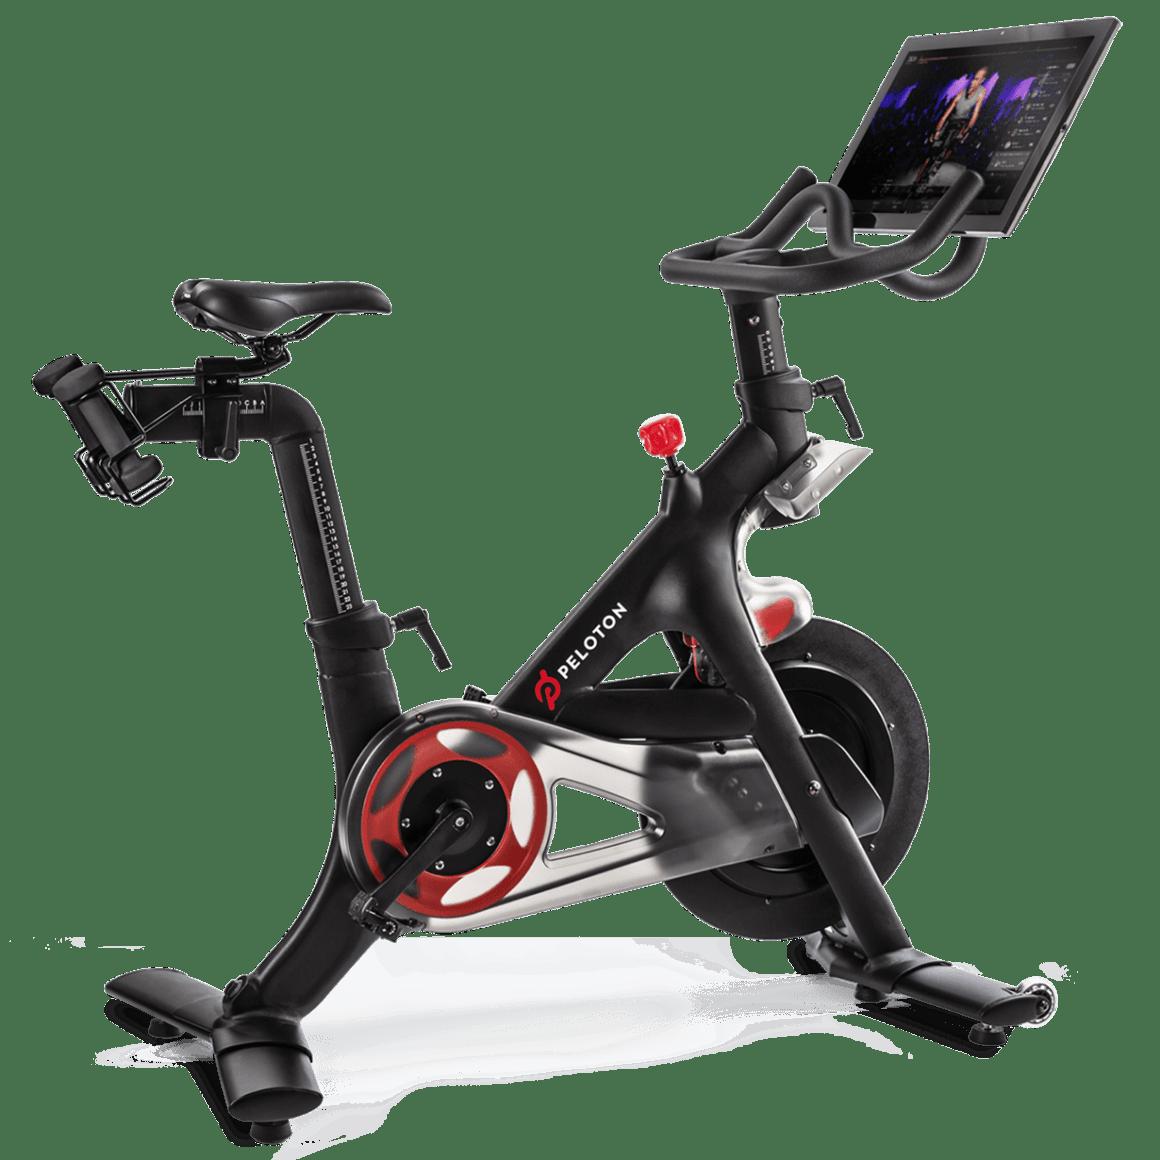 Peloton Bike Indoor Exercise Bike With Online Streaming